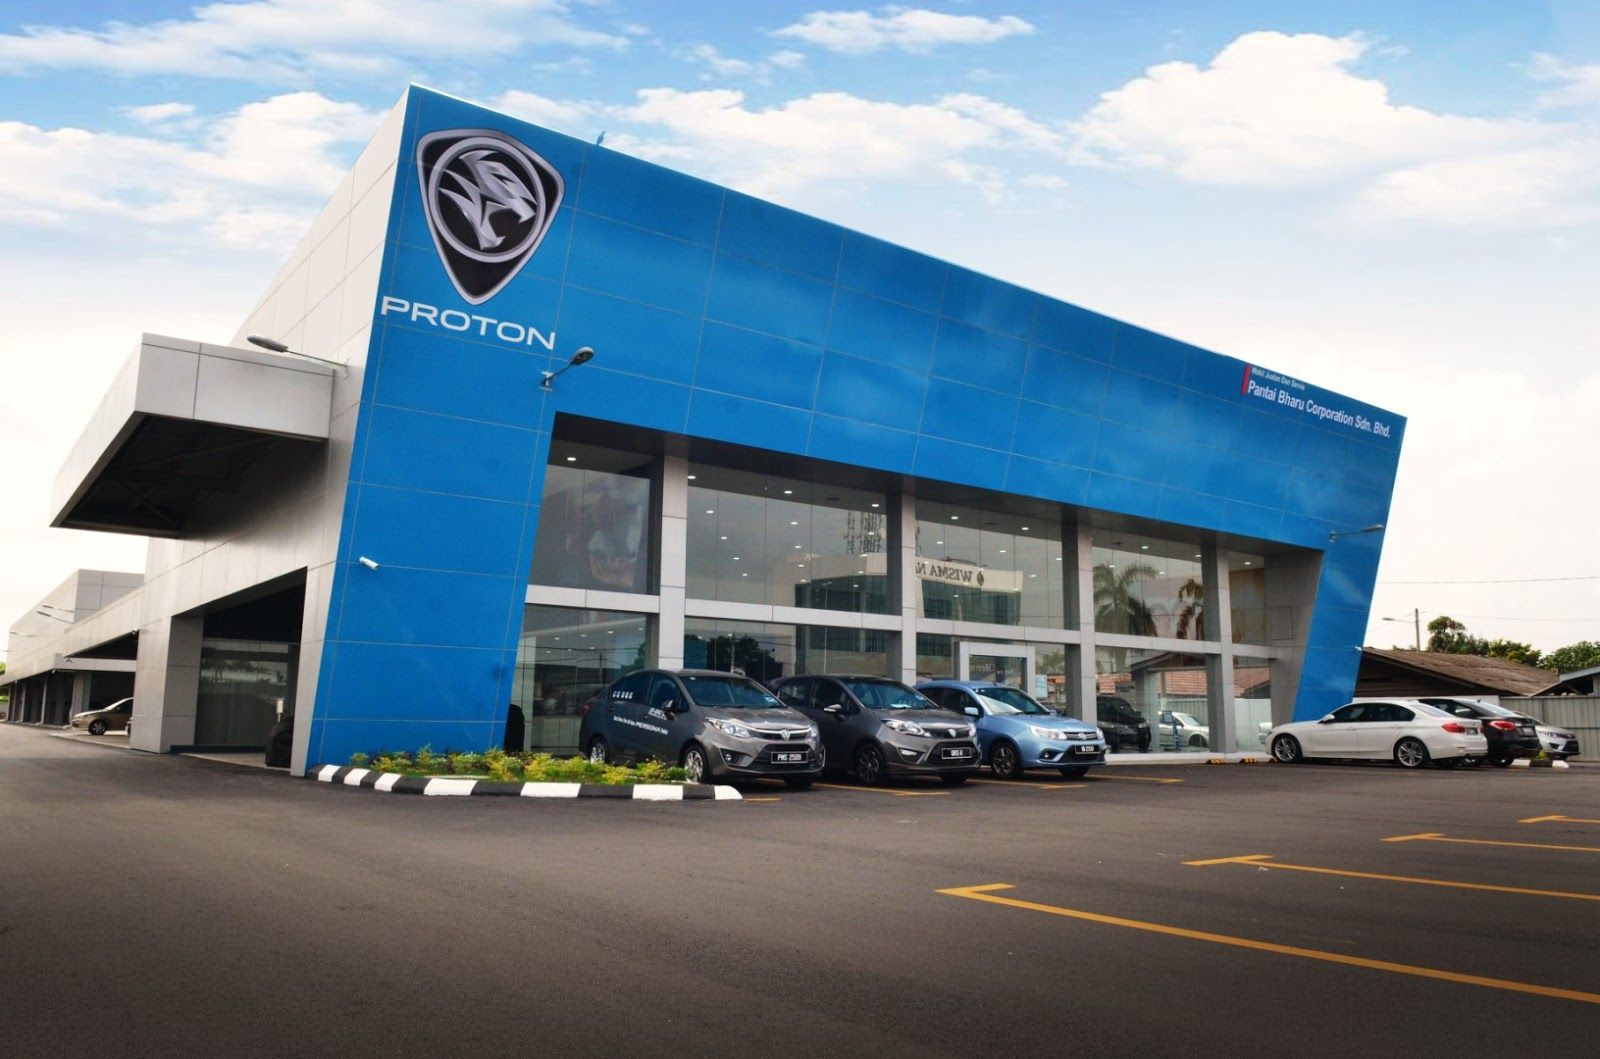 Motoring Malaysia Pantai Bharu Corporation Opens Its New Proton 3s